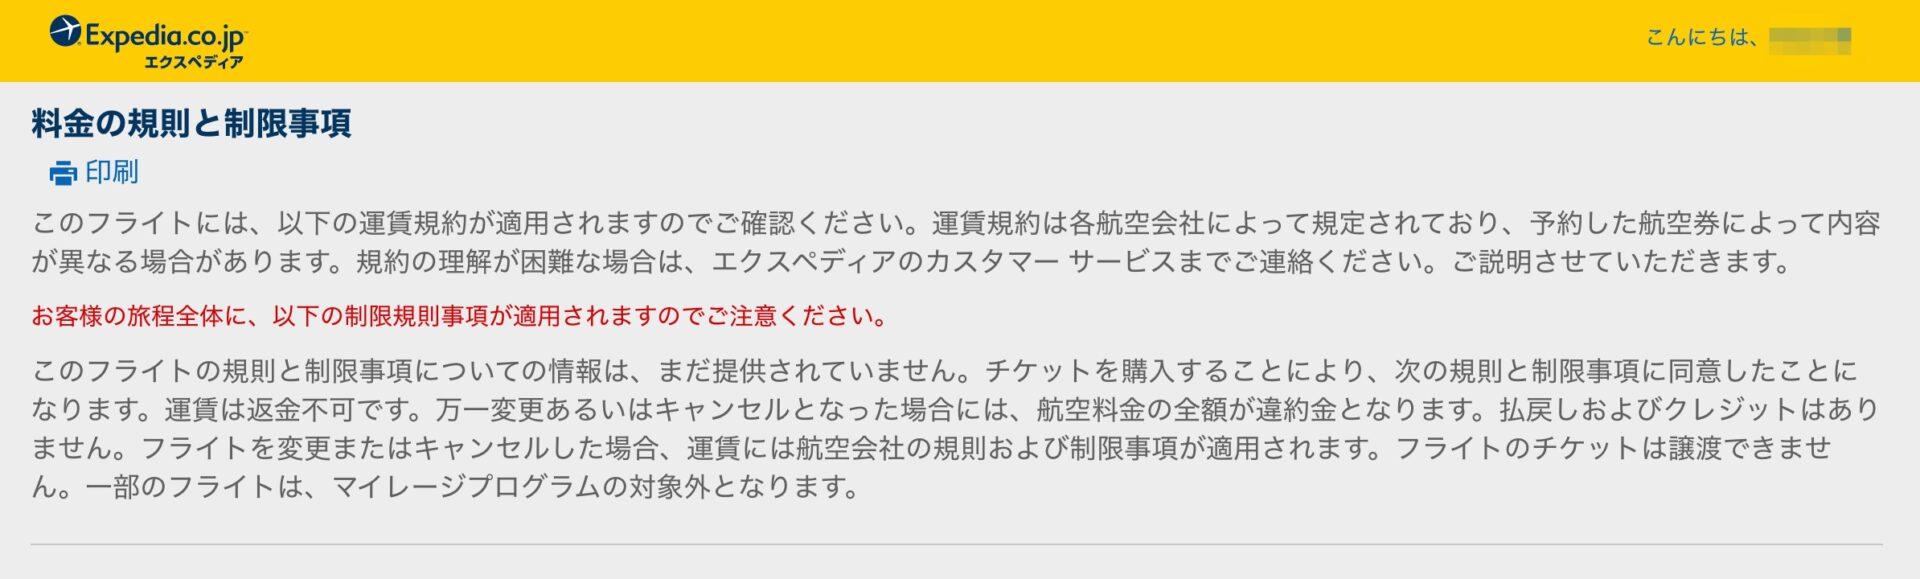 expedia_message